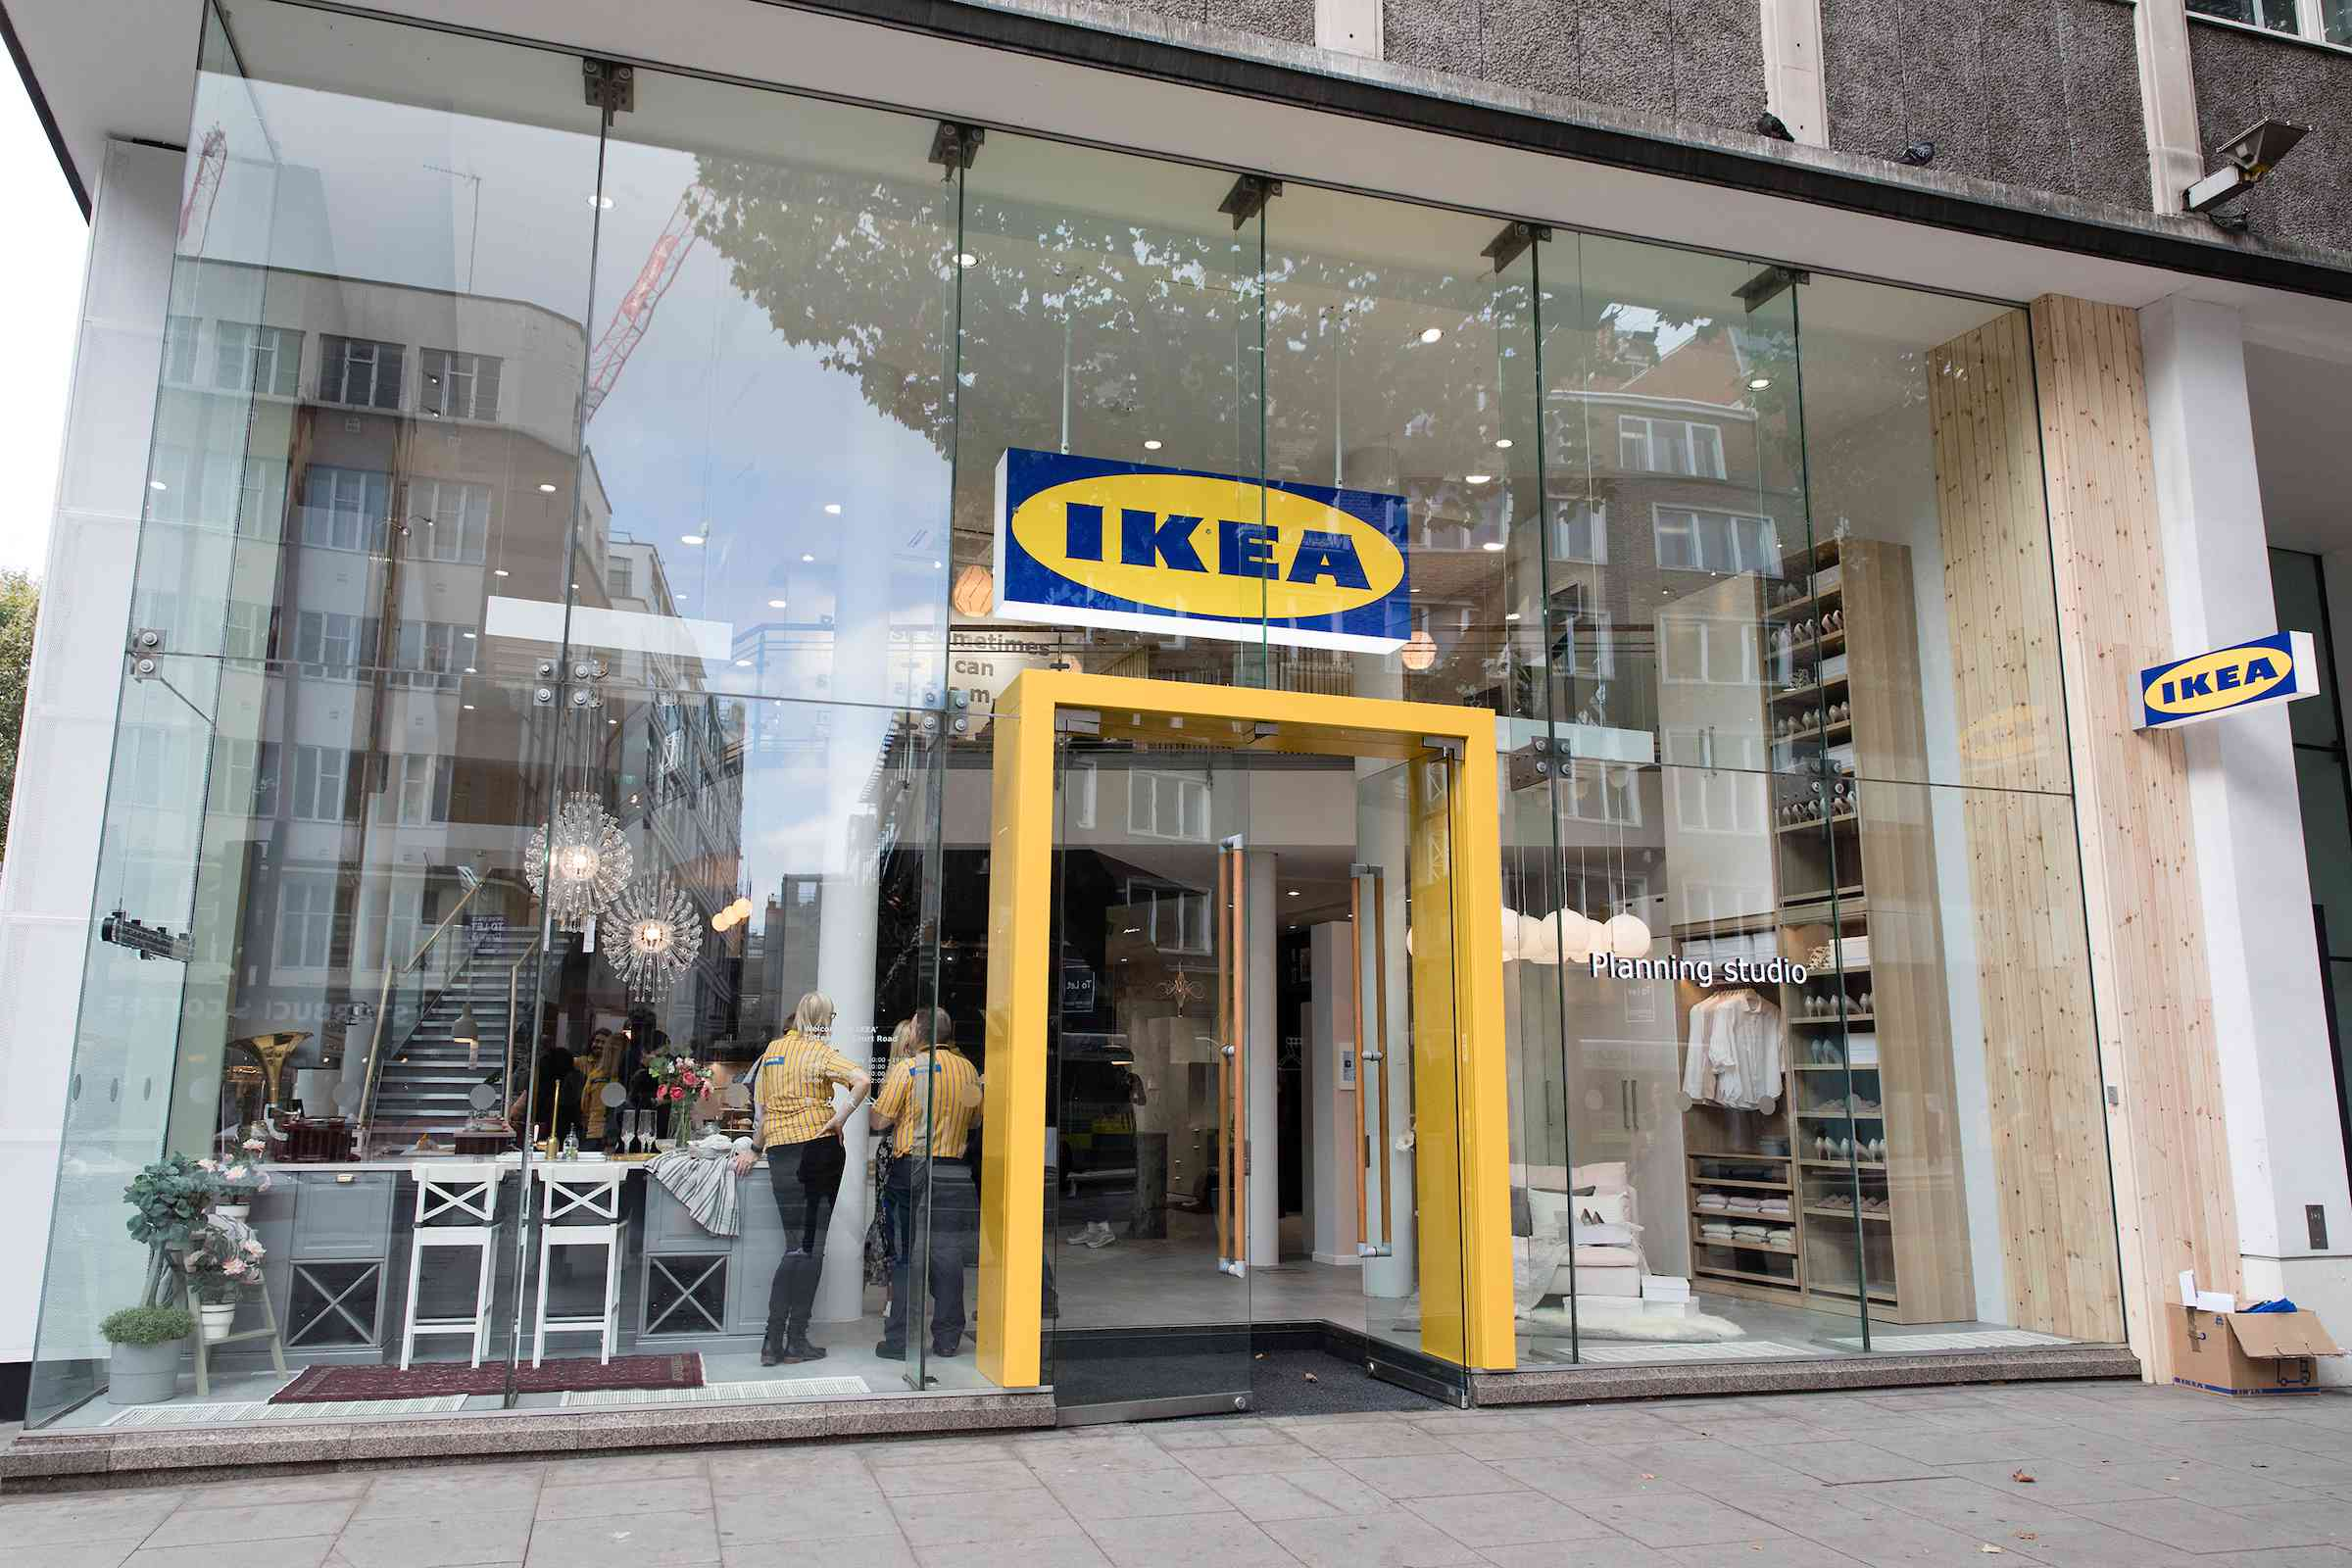 Ikea Planning Studio, London